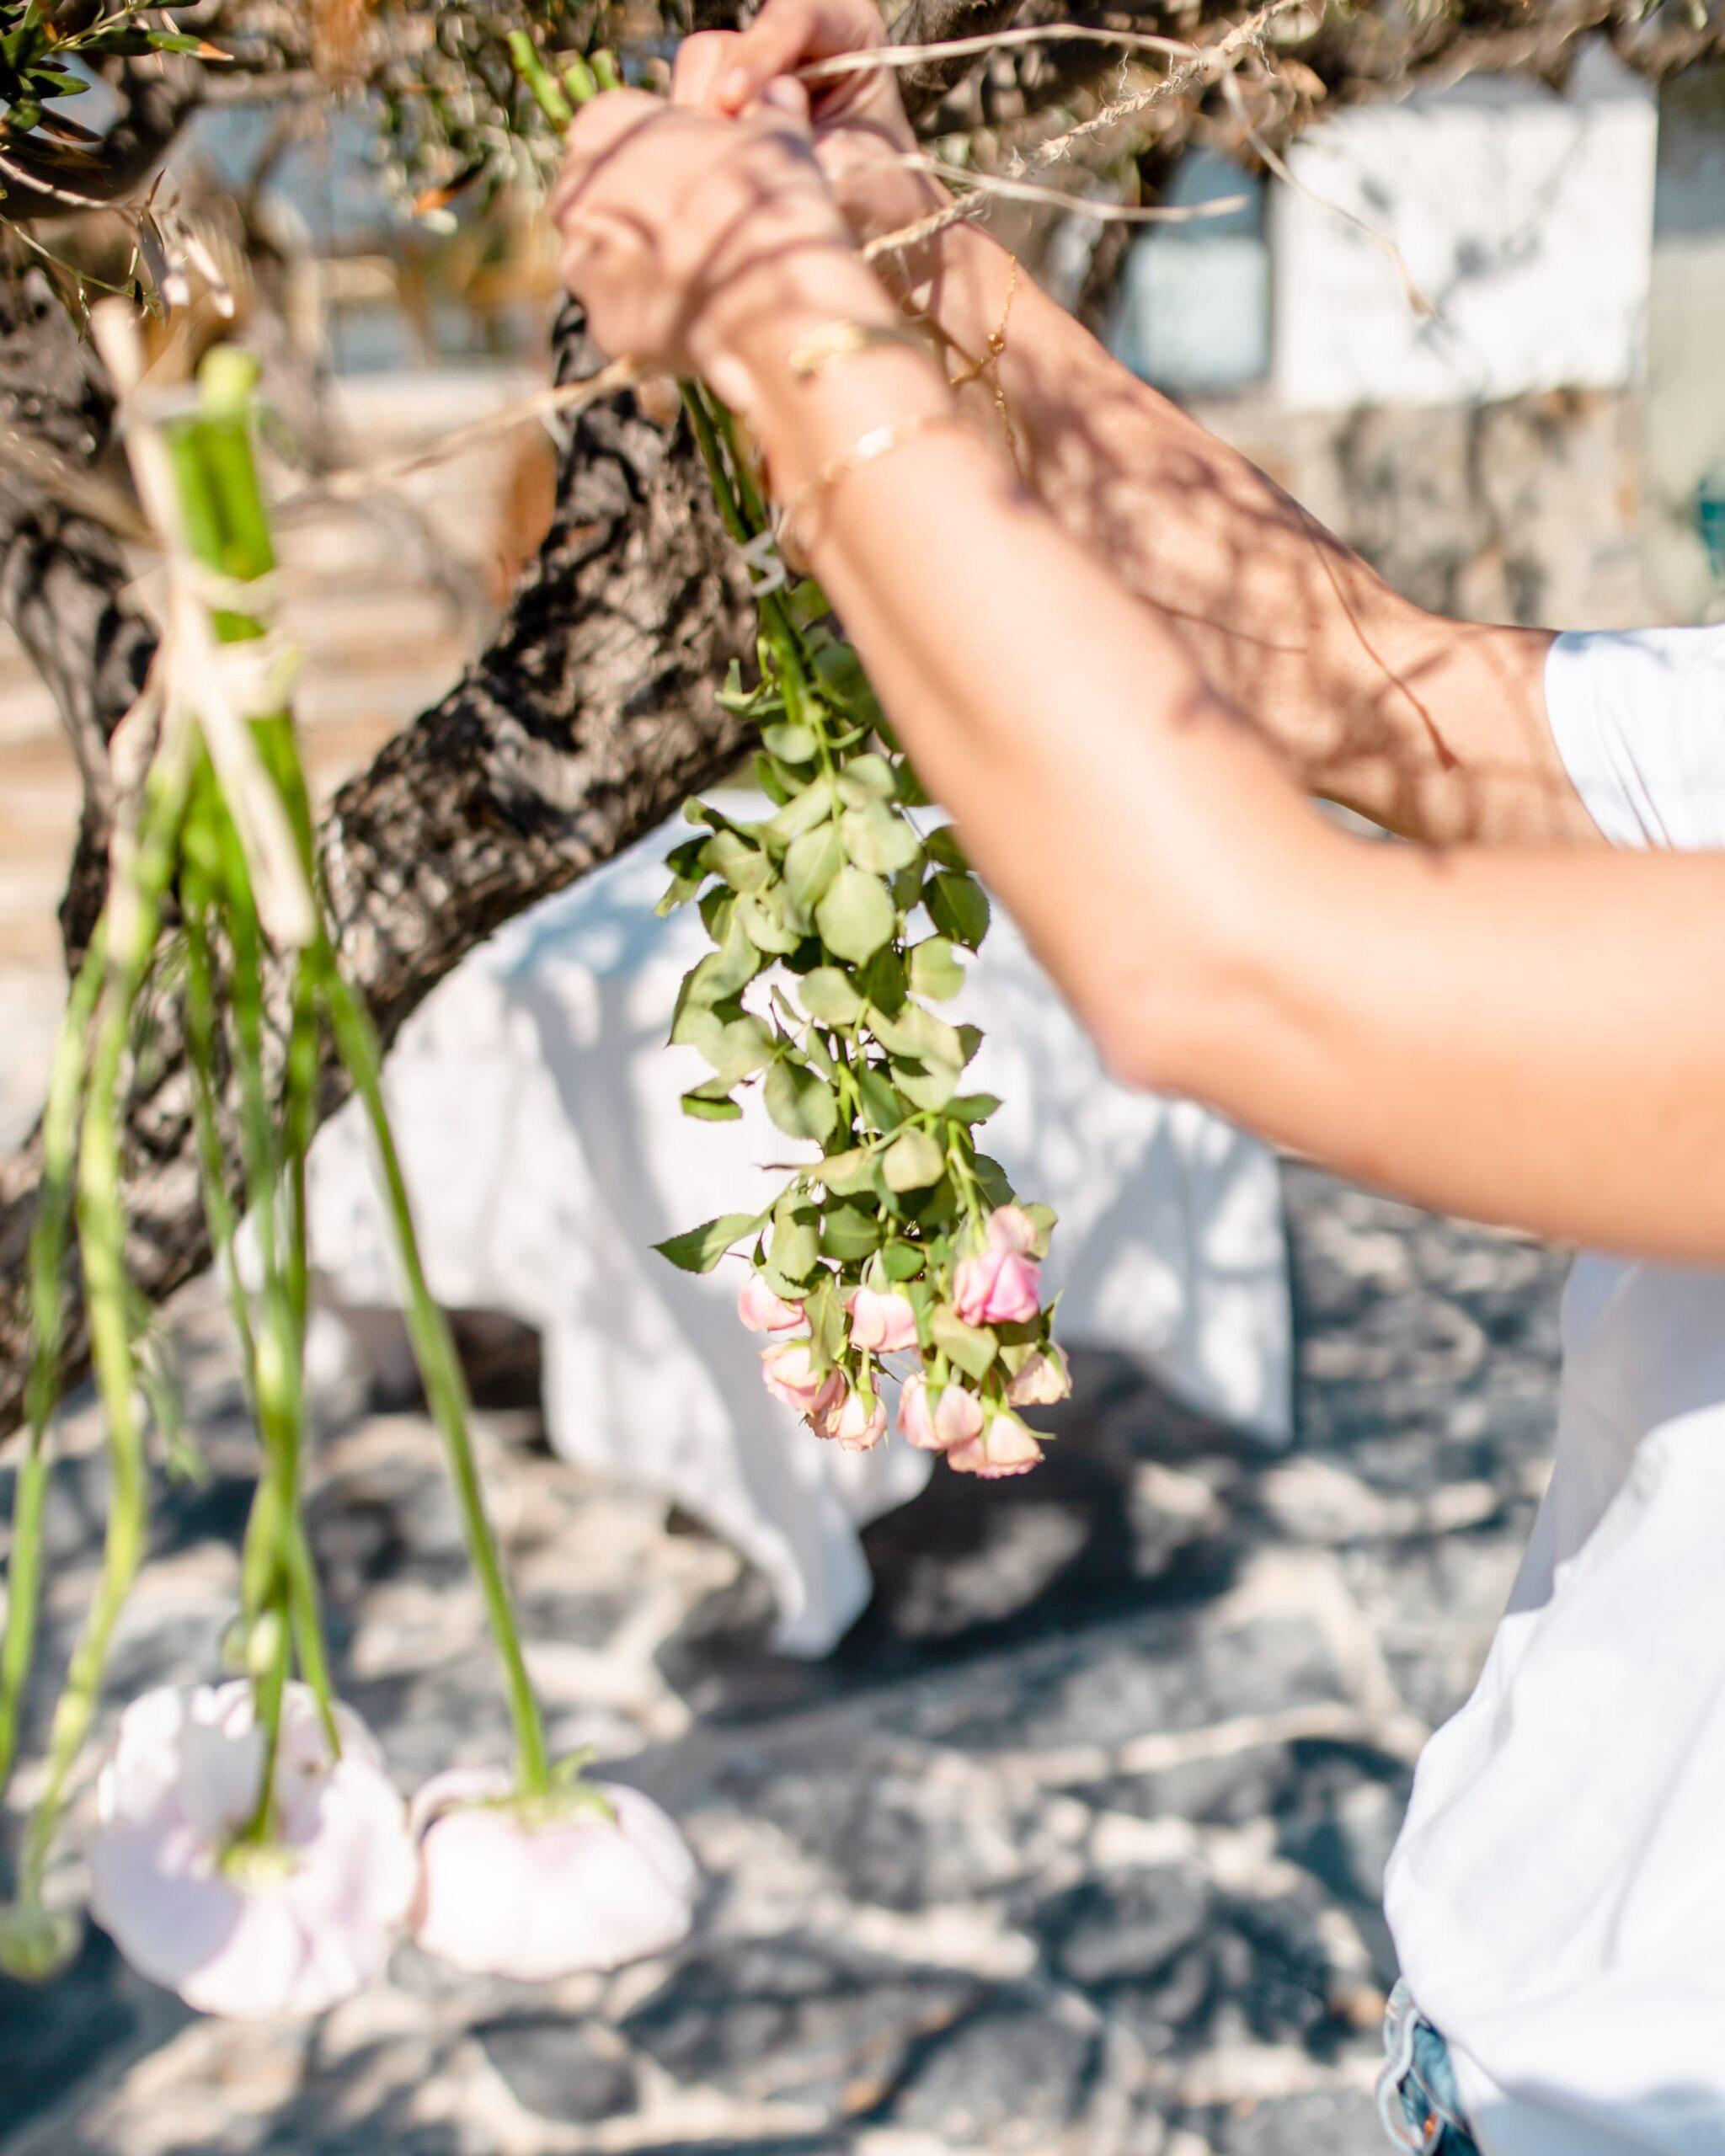 Bouquet de fleurs fraiche Rosa Cadaqués